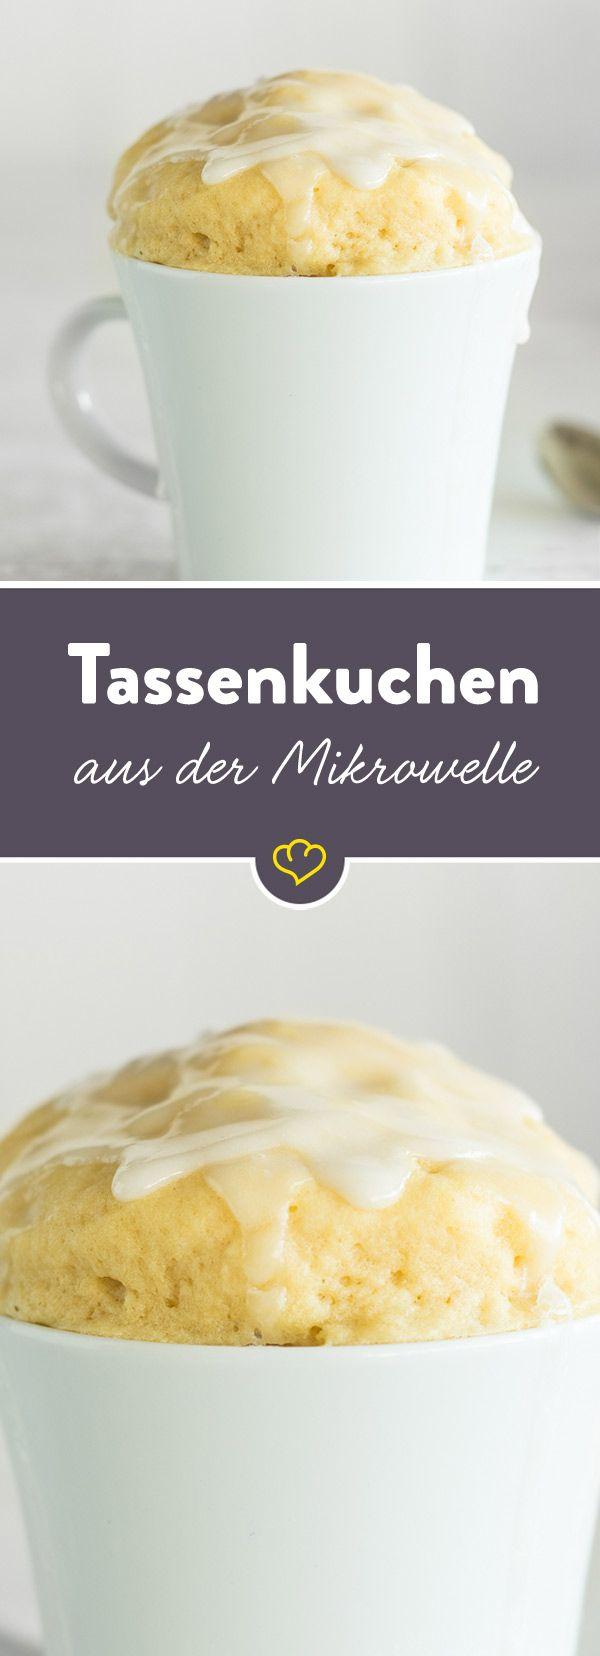 Tassenkuchen Aus Der Mikrowelle Das Grundrezept Rezept Cupcakes